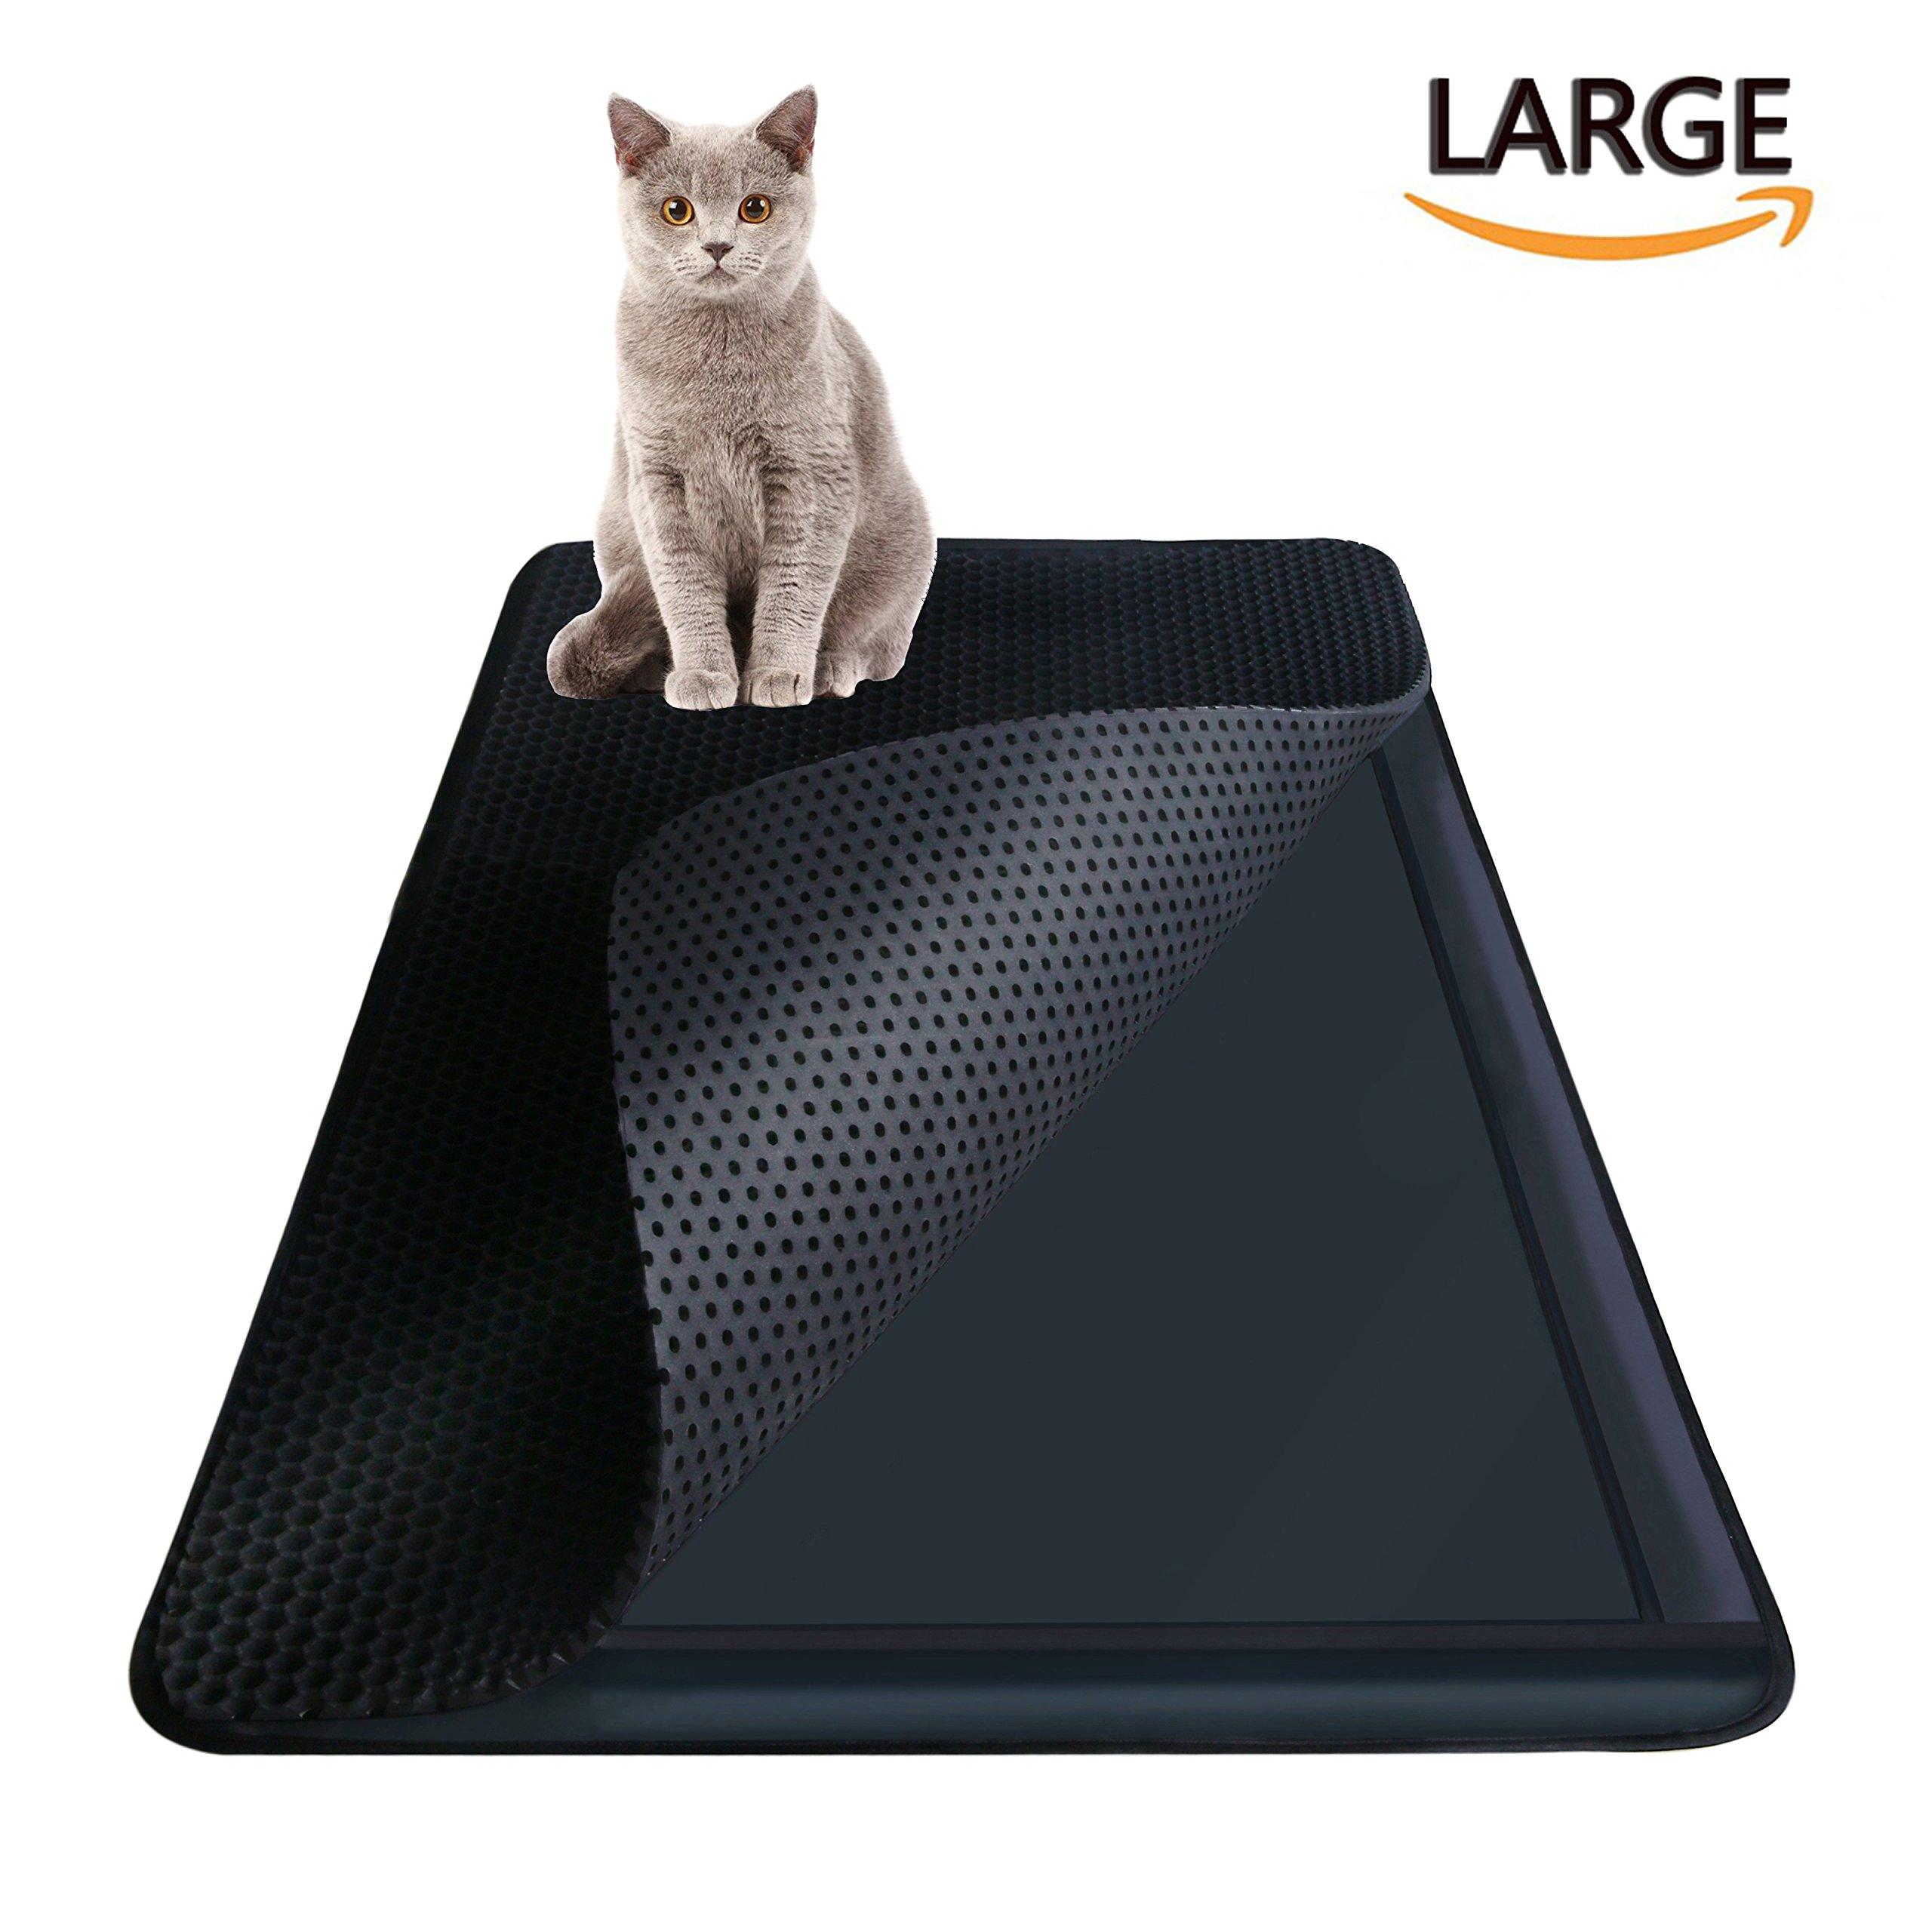 Highland Farms Select Cat Litter Mat - Cat Litter Box Trapper with EZ Clean Large Holes - Waterproof Double Layer Cat Litter Mat Catcher, Large Size 30'' X 23''